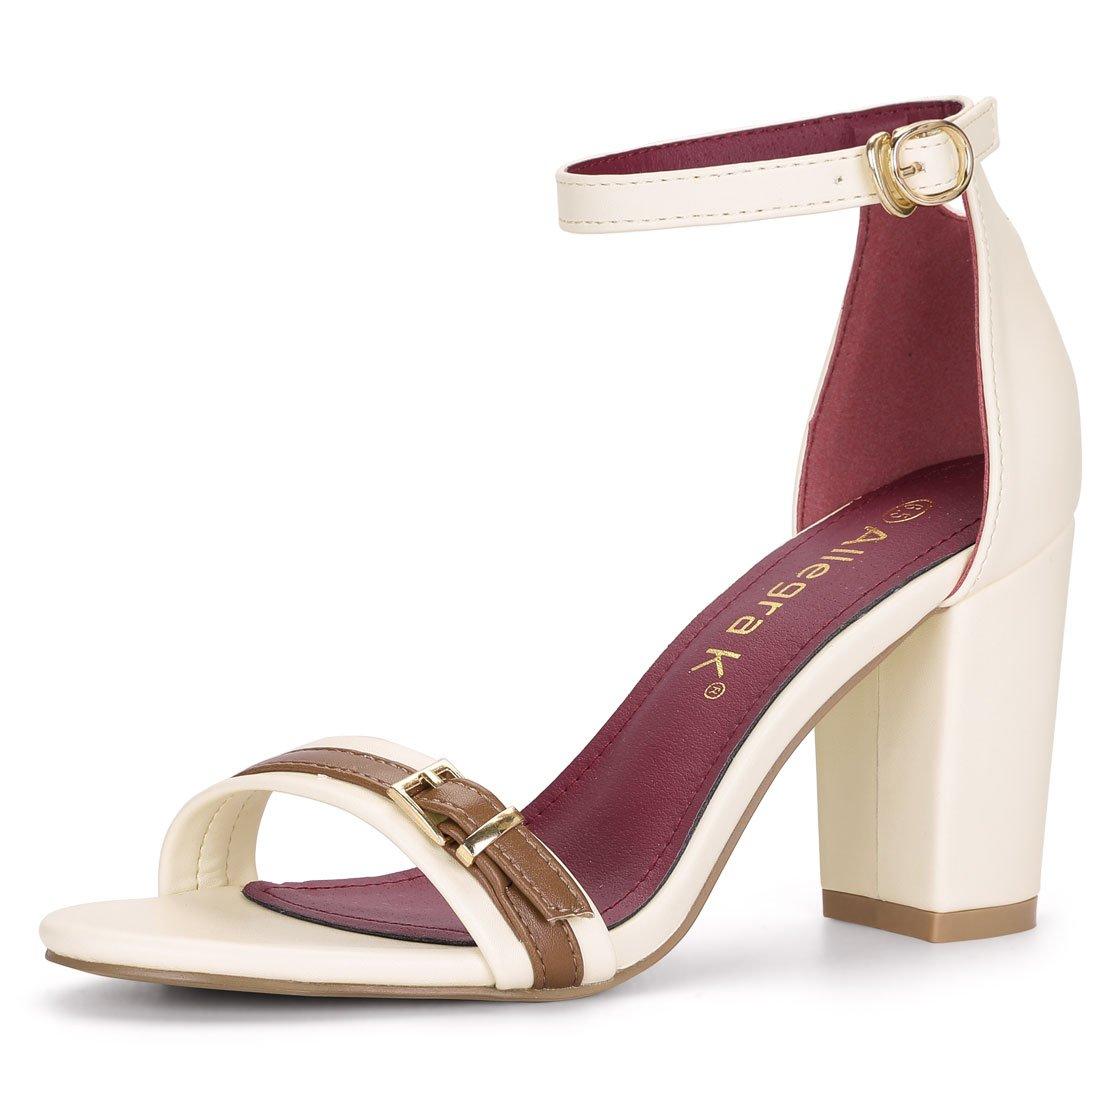 Allegra K Women's Ankle Strap Chunky Heel Ivory Sandals 5.5 M US